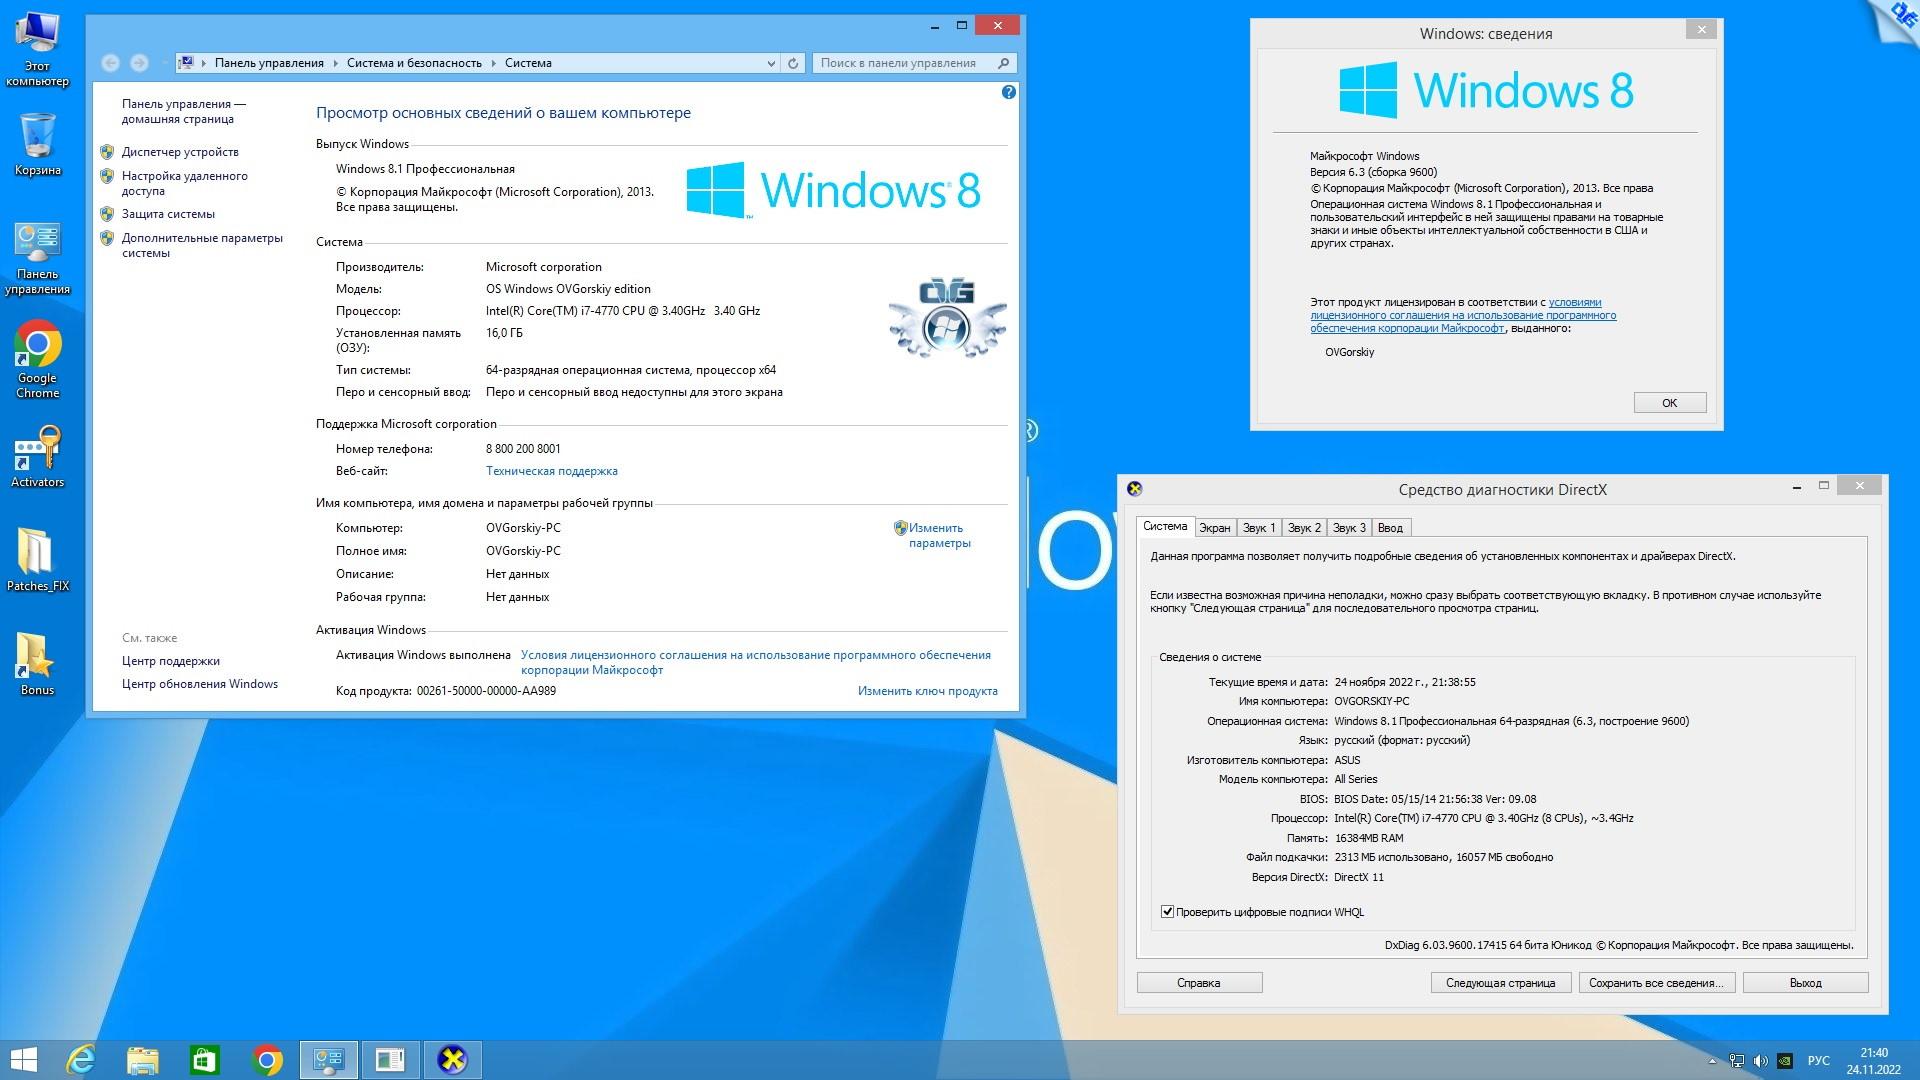 windows 8 pro x64 pt br original iso